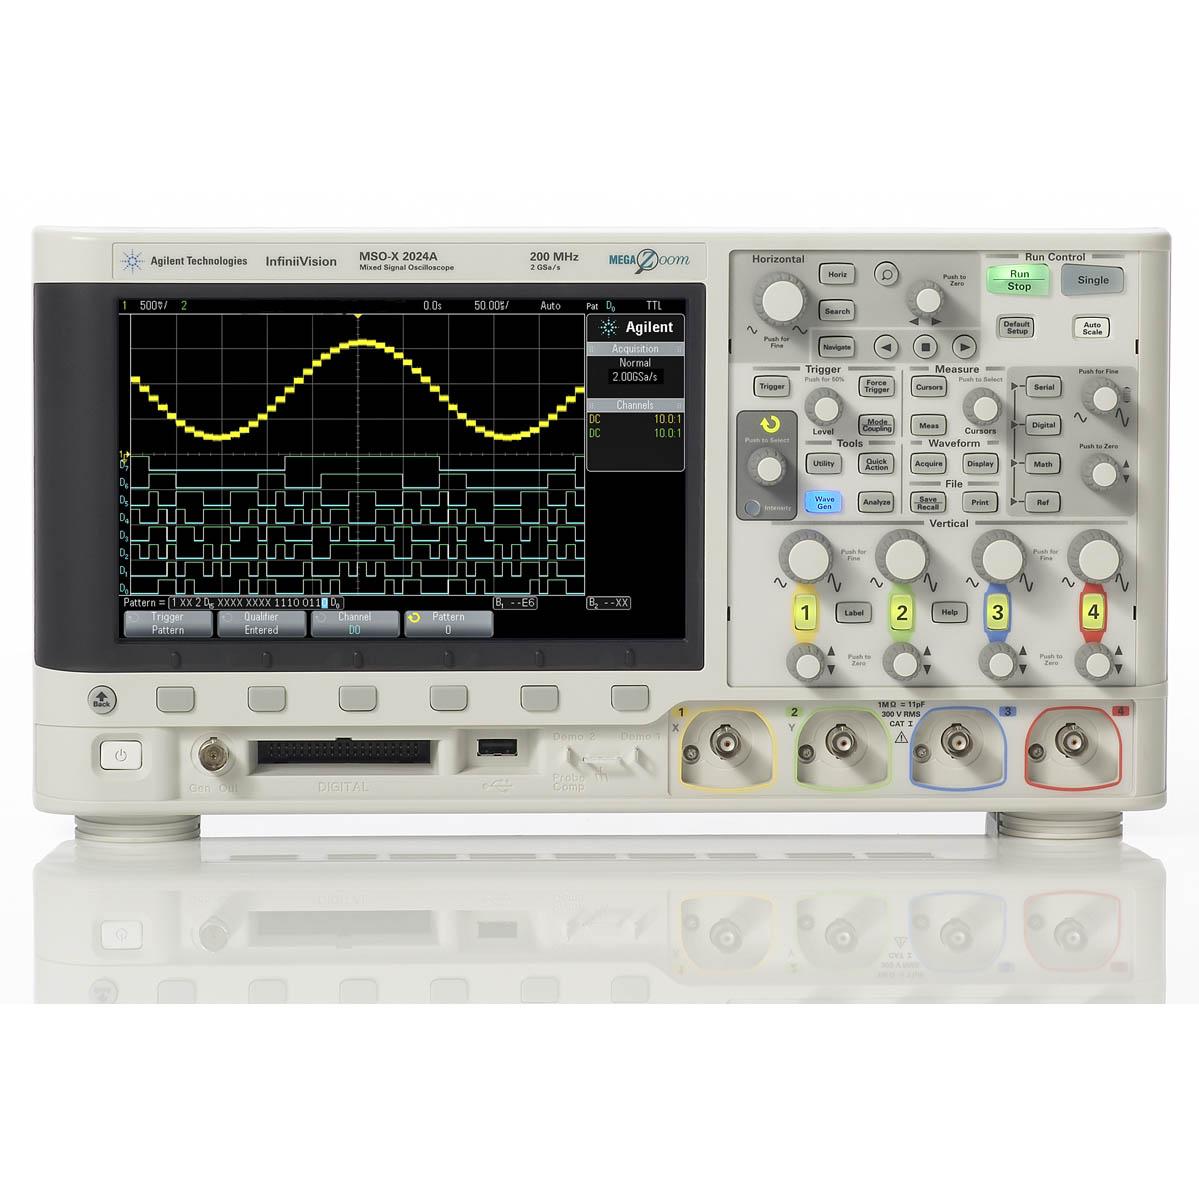 DSOX2024A/DSOX2EMBD,N6458A デジタルオシロスコープ